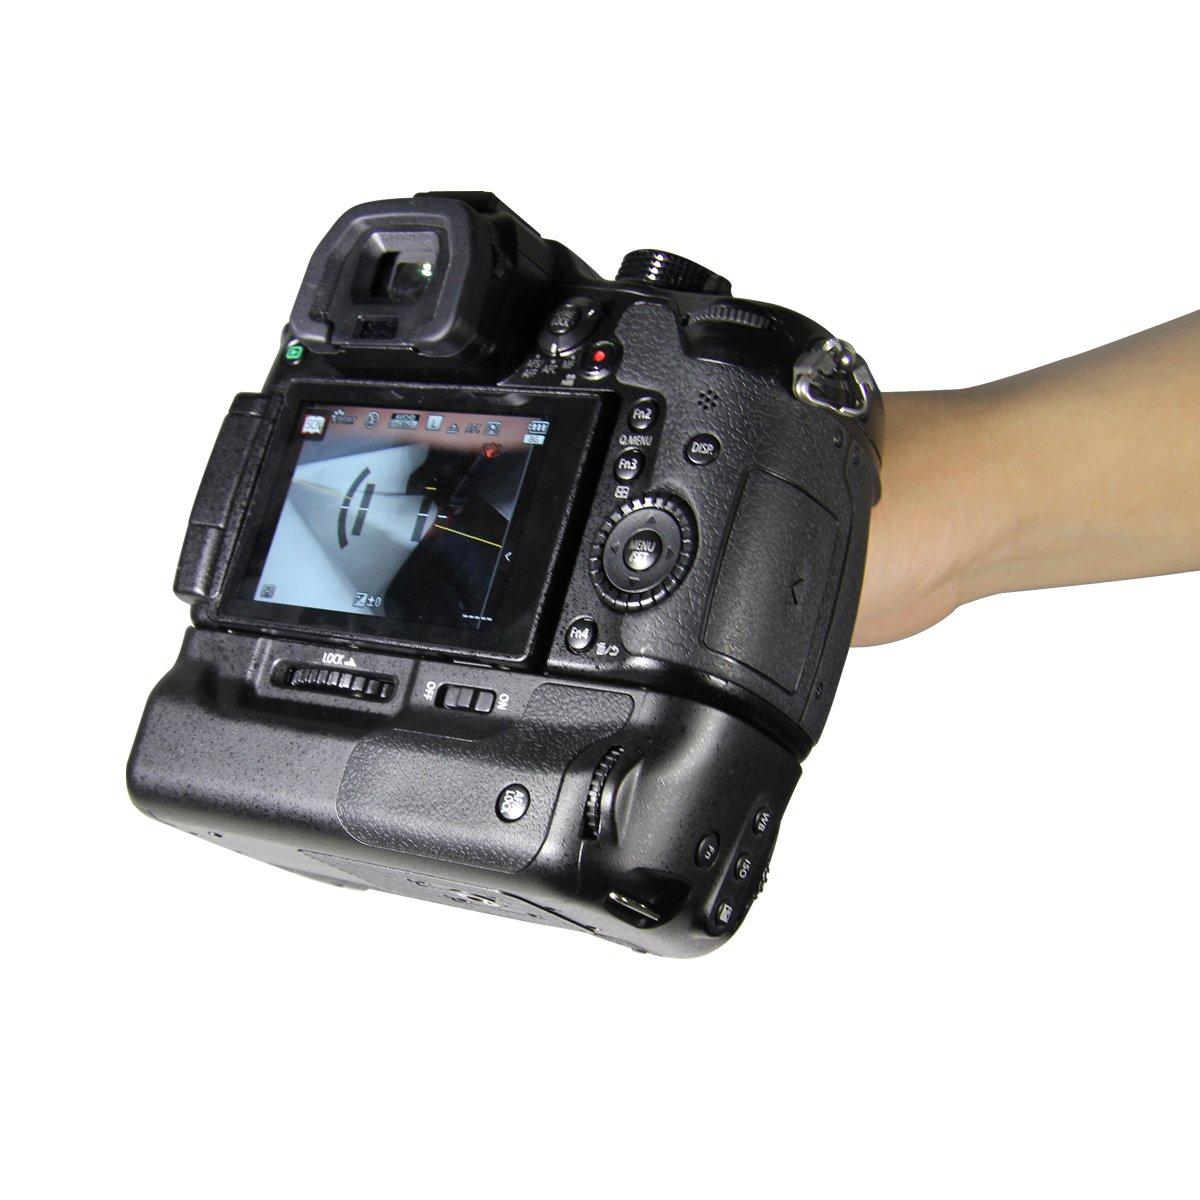 Dmw Bggh3 Newmowa Vertical Battery Grip Replacement For Wasabi Blf19 Kit Panasonic Gh3 Gh4 Gh5 Lumix Digital Slr Camera Photo